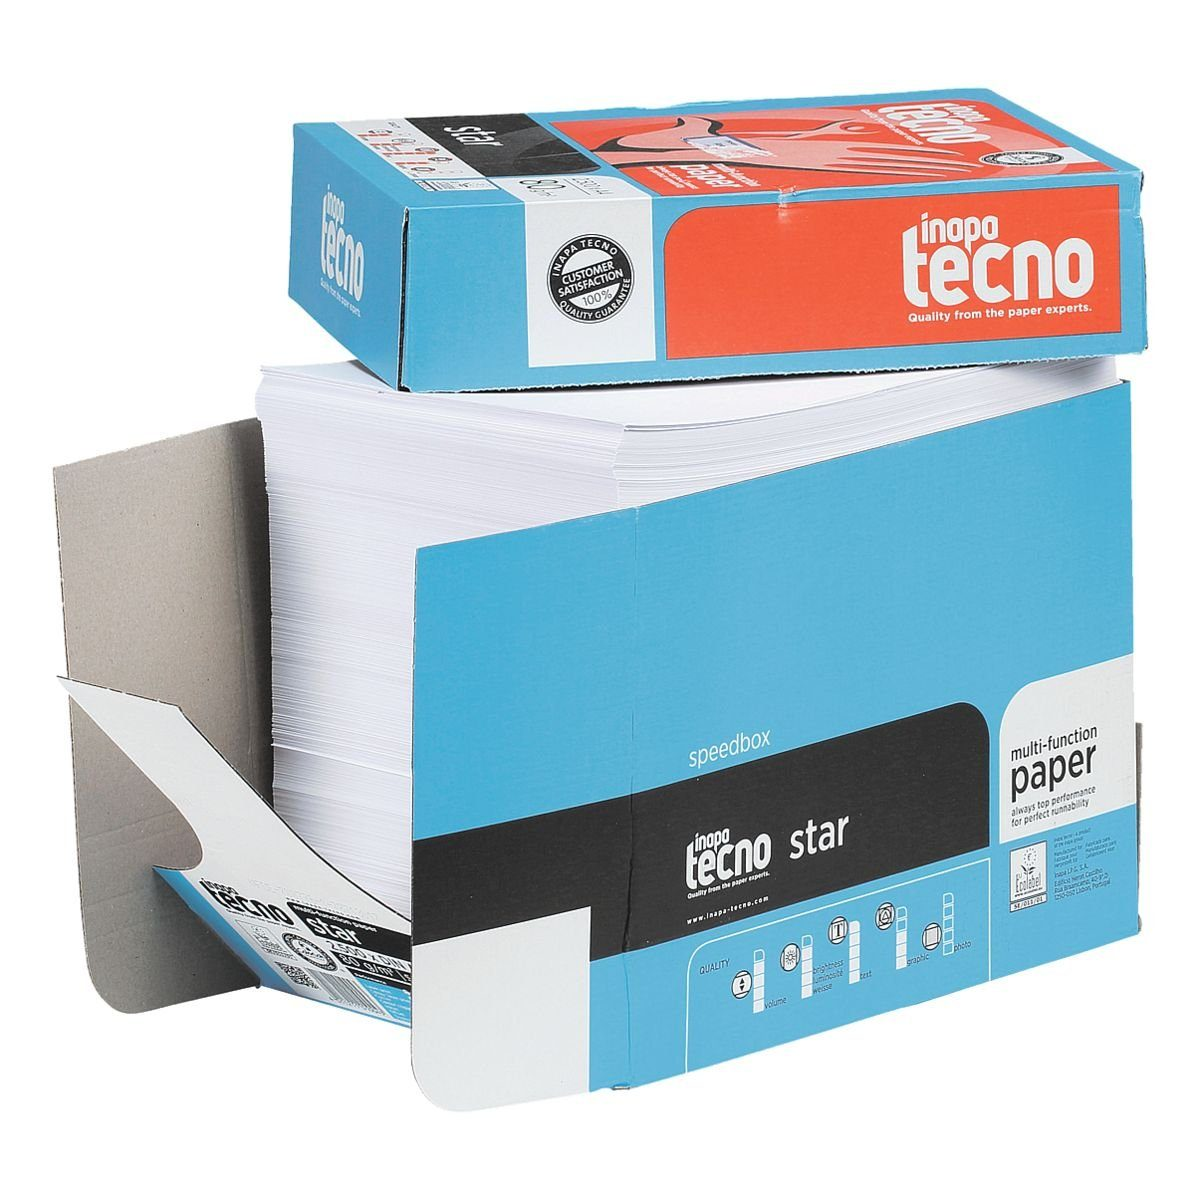 Inapa tecno Öko-Box Kopierpapier »Star«